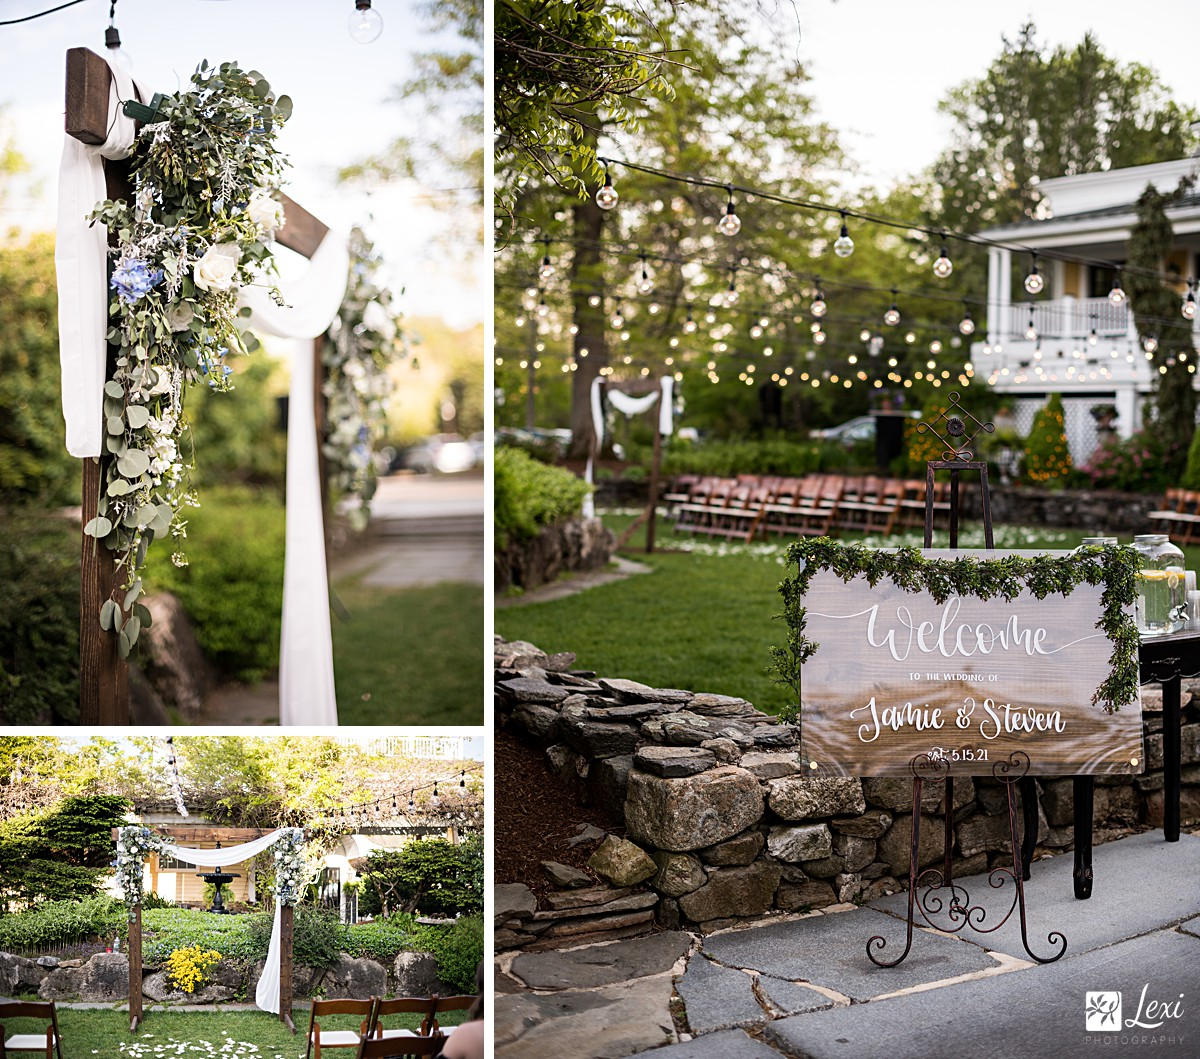 bedford-village-inn-wedding_ceremony-details.jpg